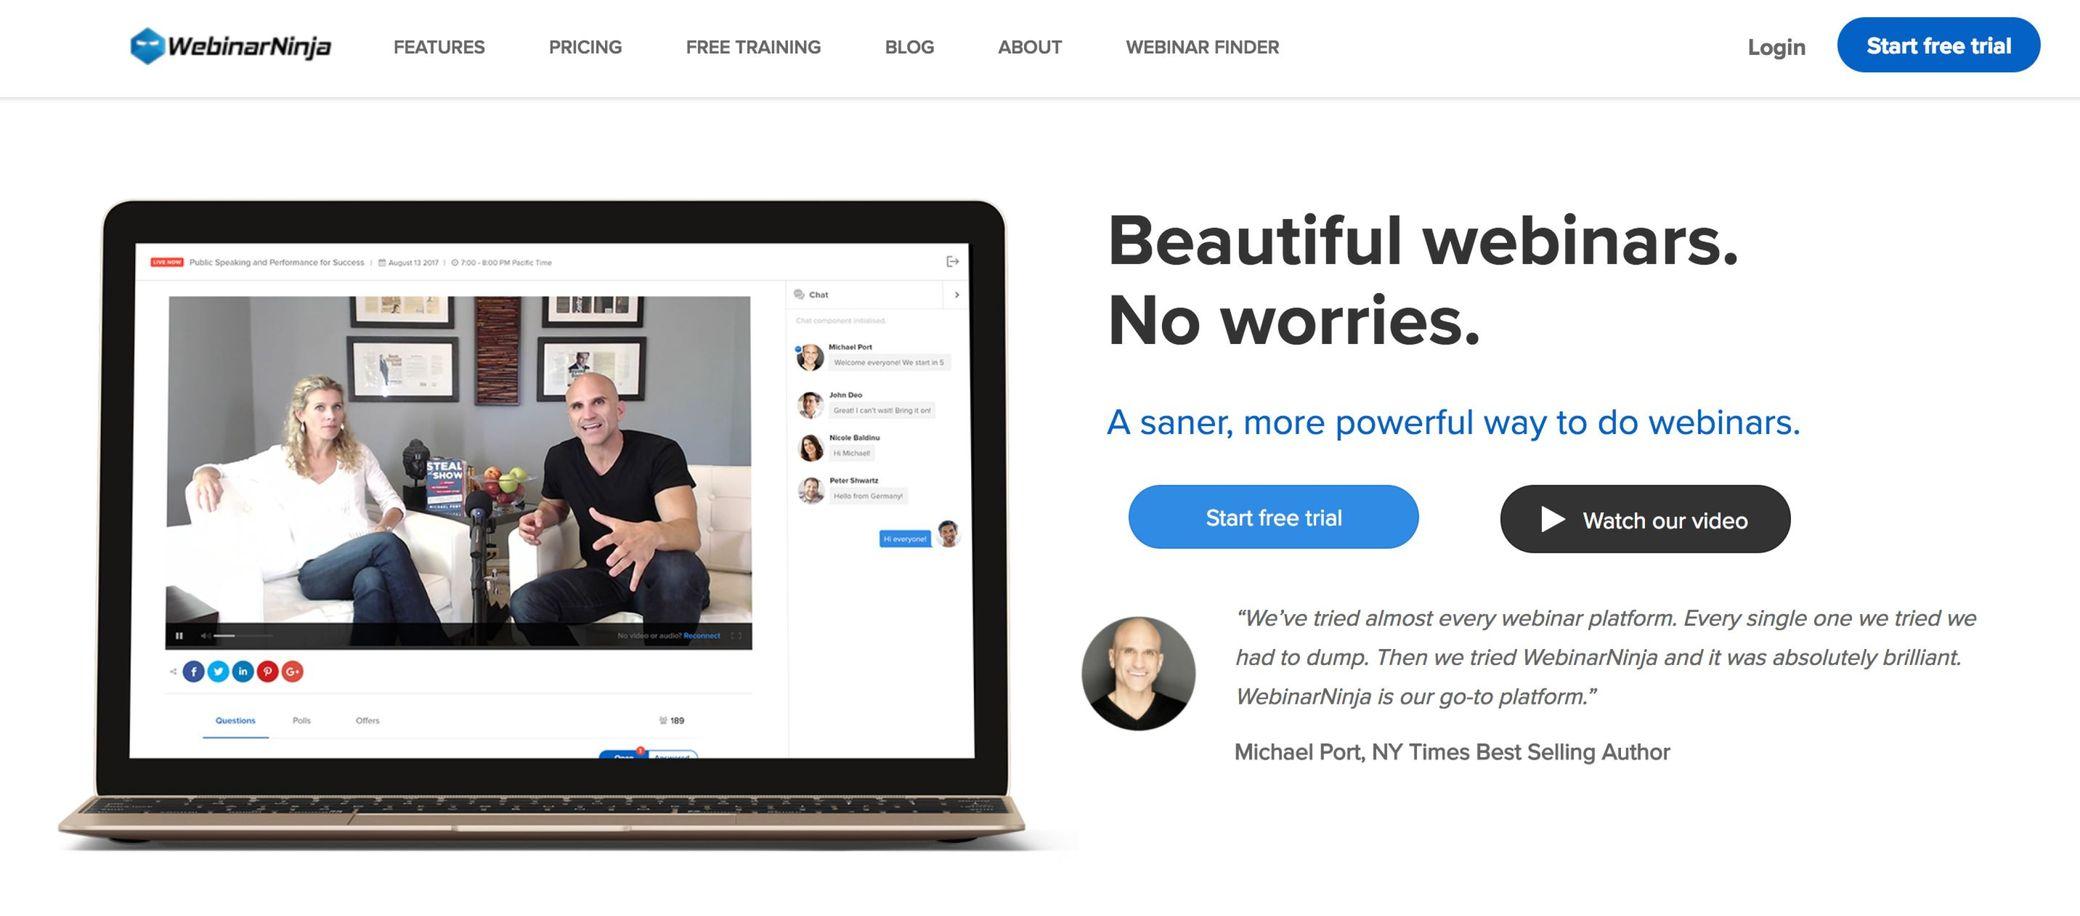 webinarninja screenshot